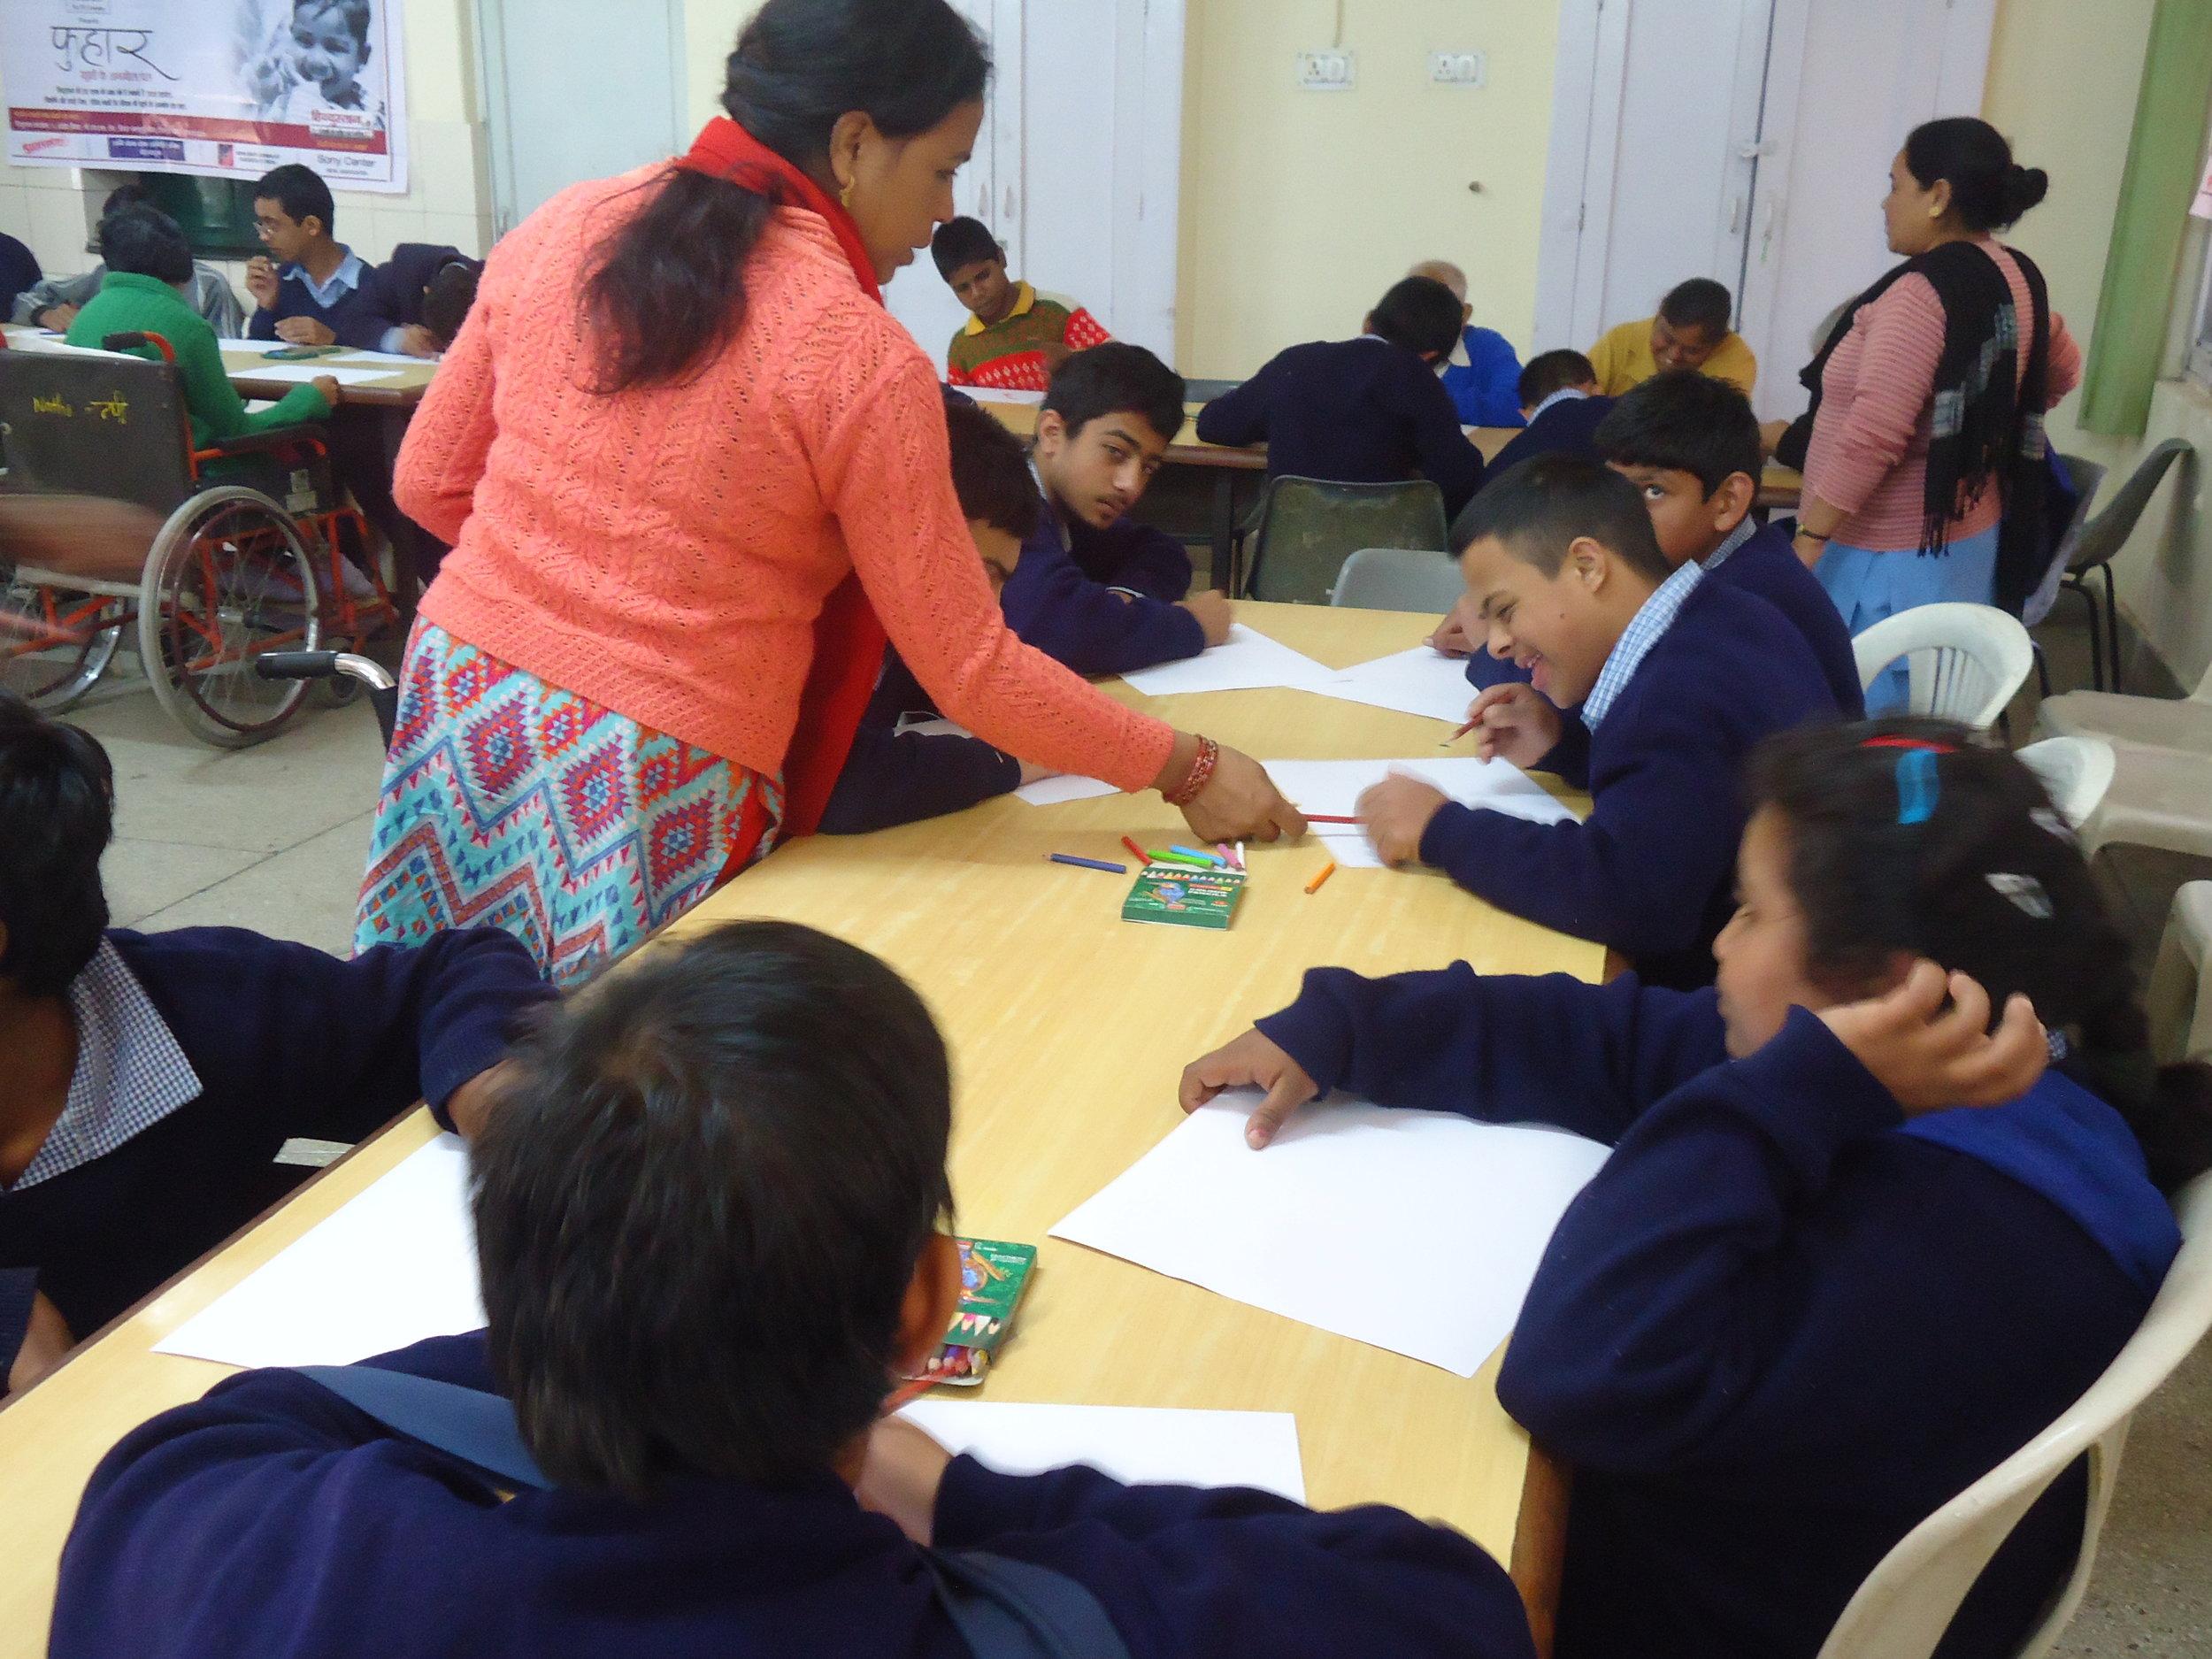 Chidlren doing activity in the classroom.JPG